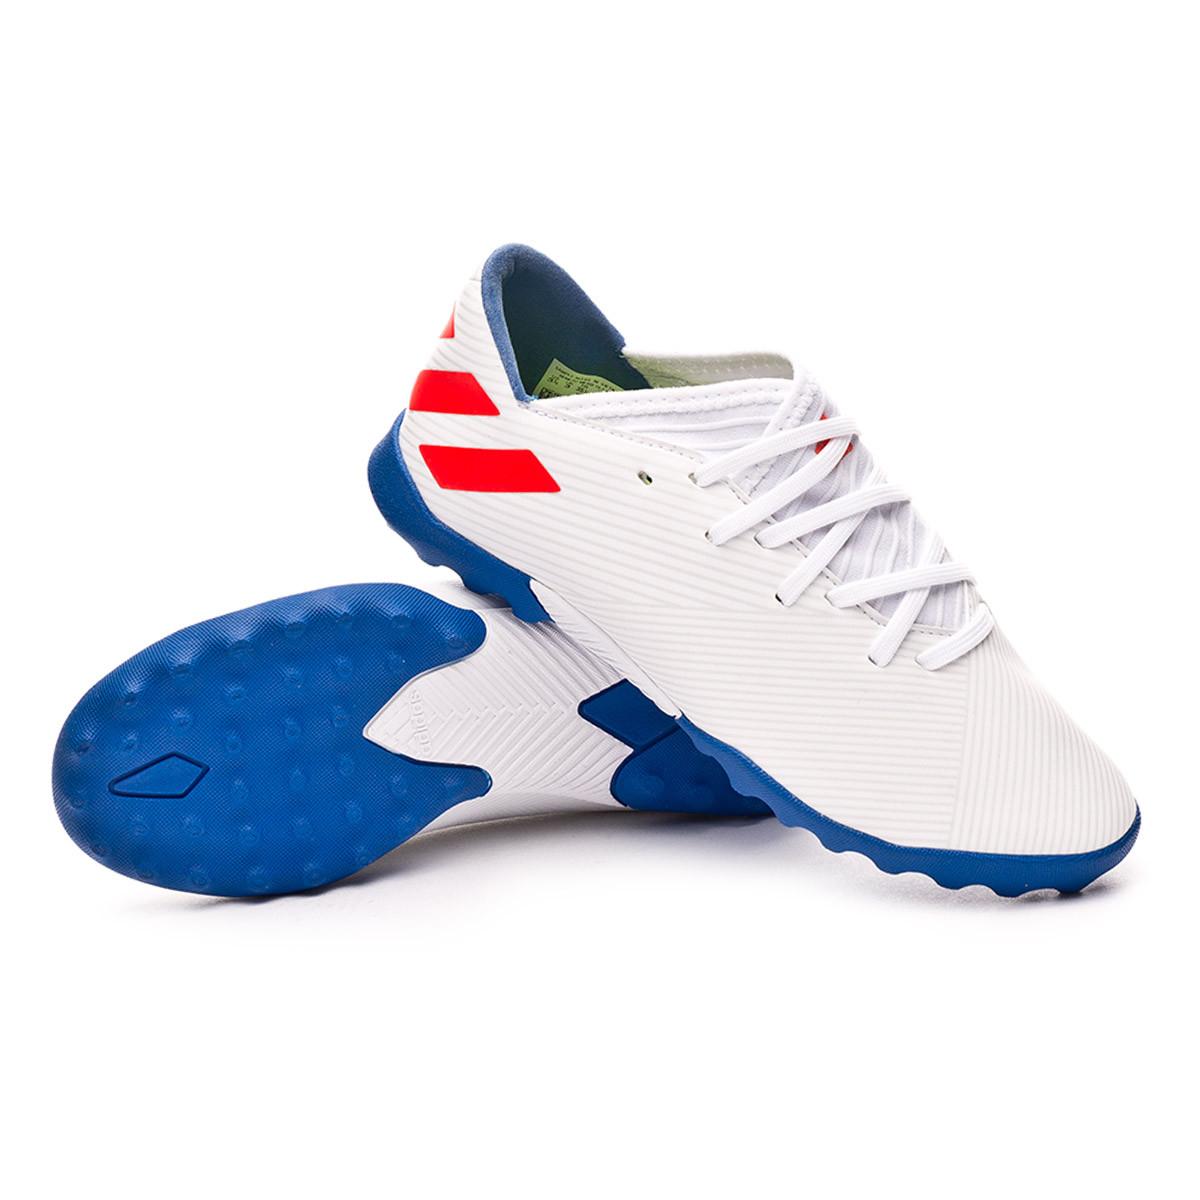 e185ae95d Football Boot adidas Kids Nemeziz Messi 19.3 Turf White-Solar red-Football  blue - Football store Fútbol Emotion